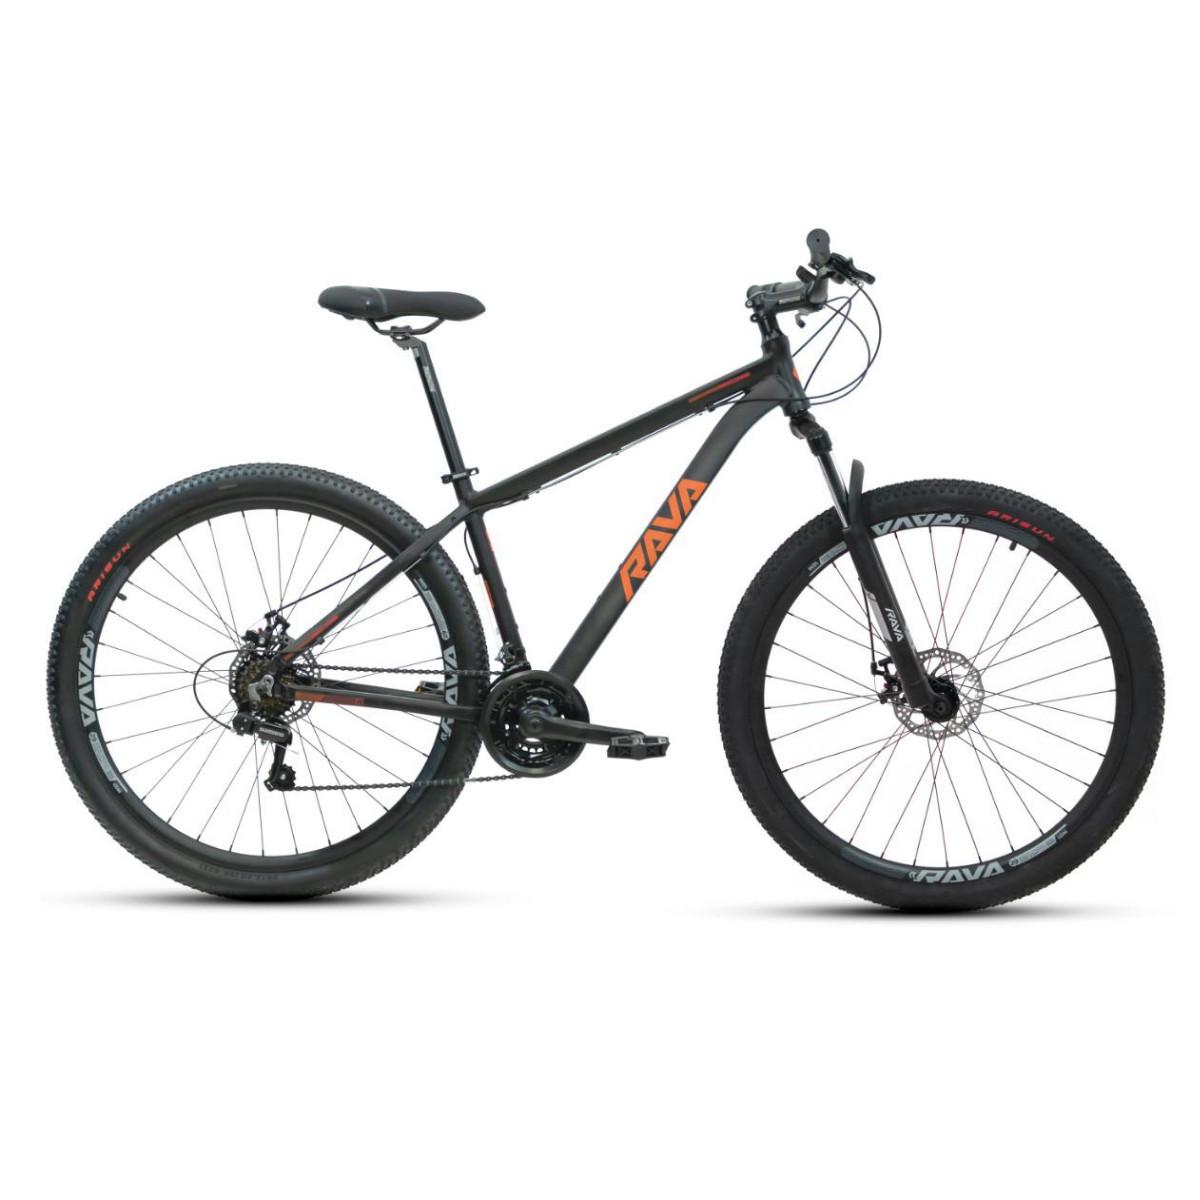 Bicicleta Mtb Rava Pressure 21V 2021 - Preto e Vermelho